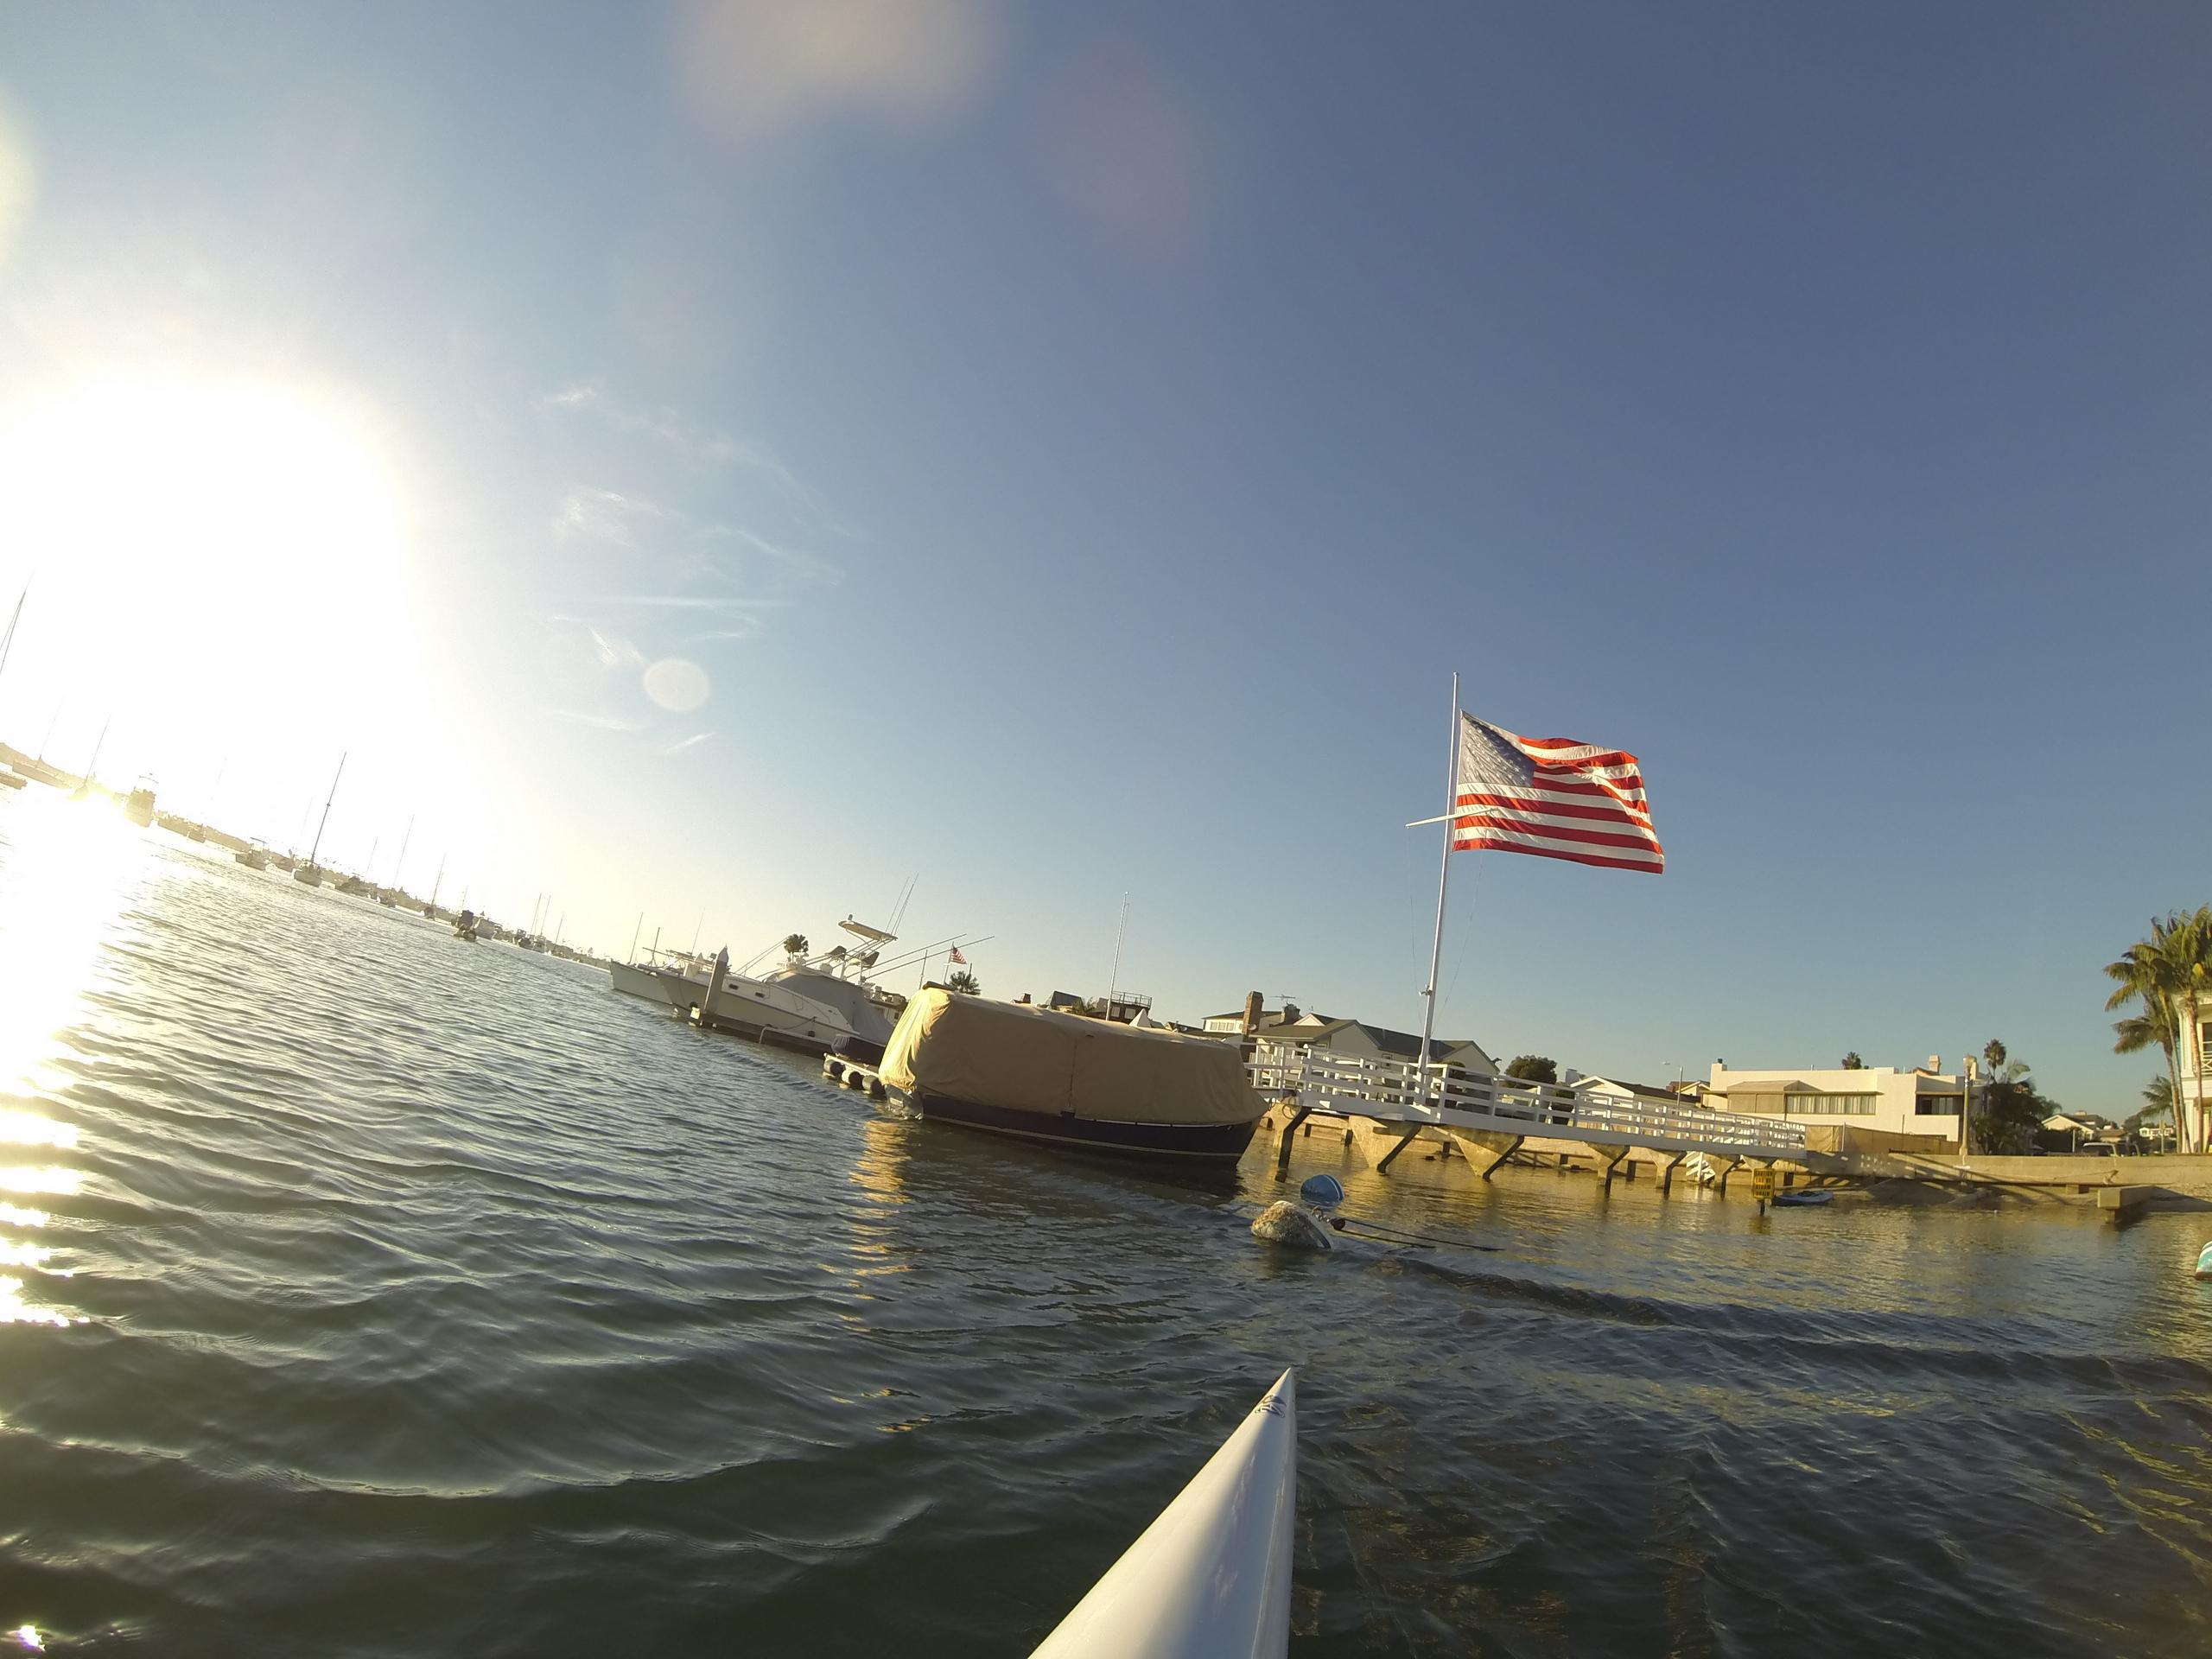 Tuesday 8 Nov 16 – Balboa Island: 6 miles